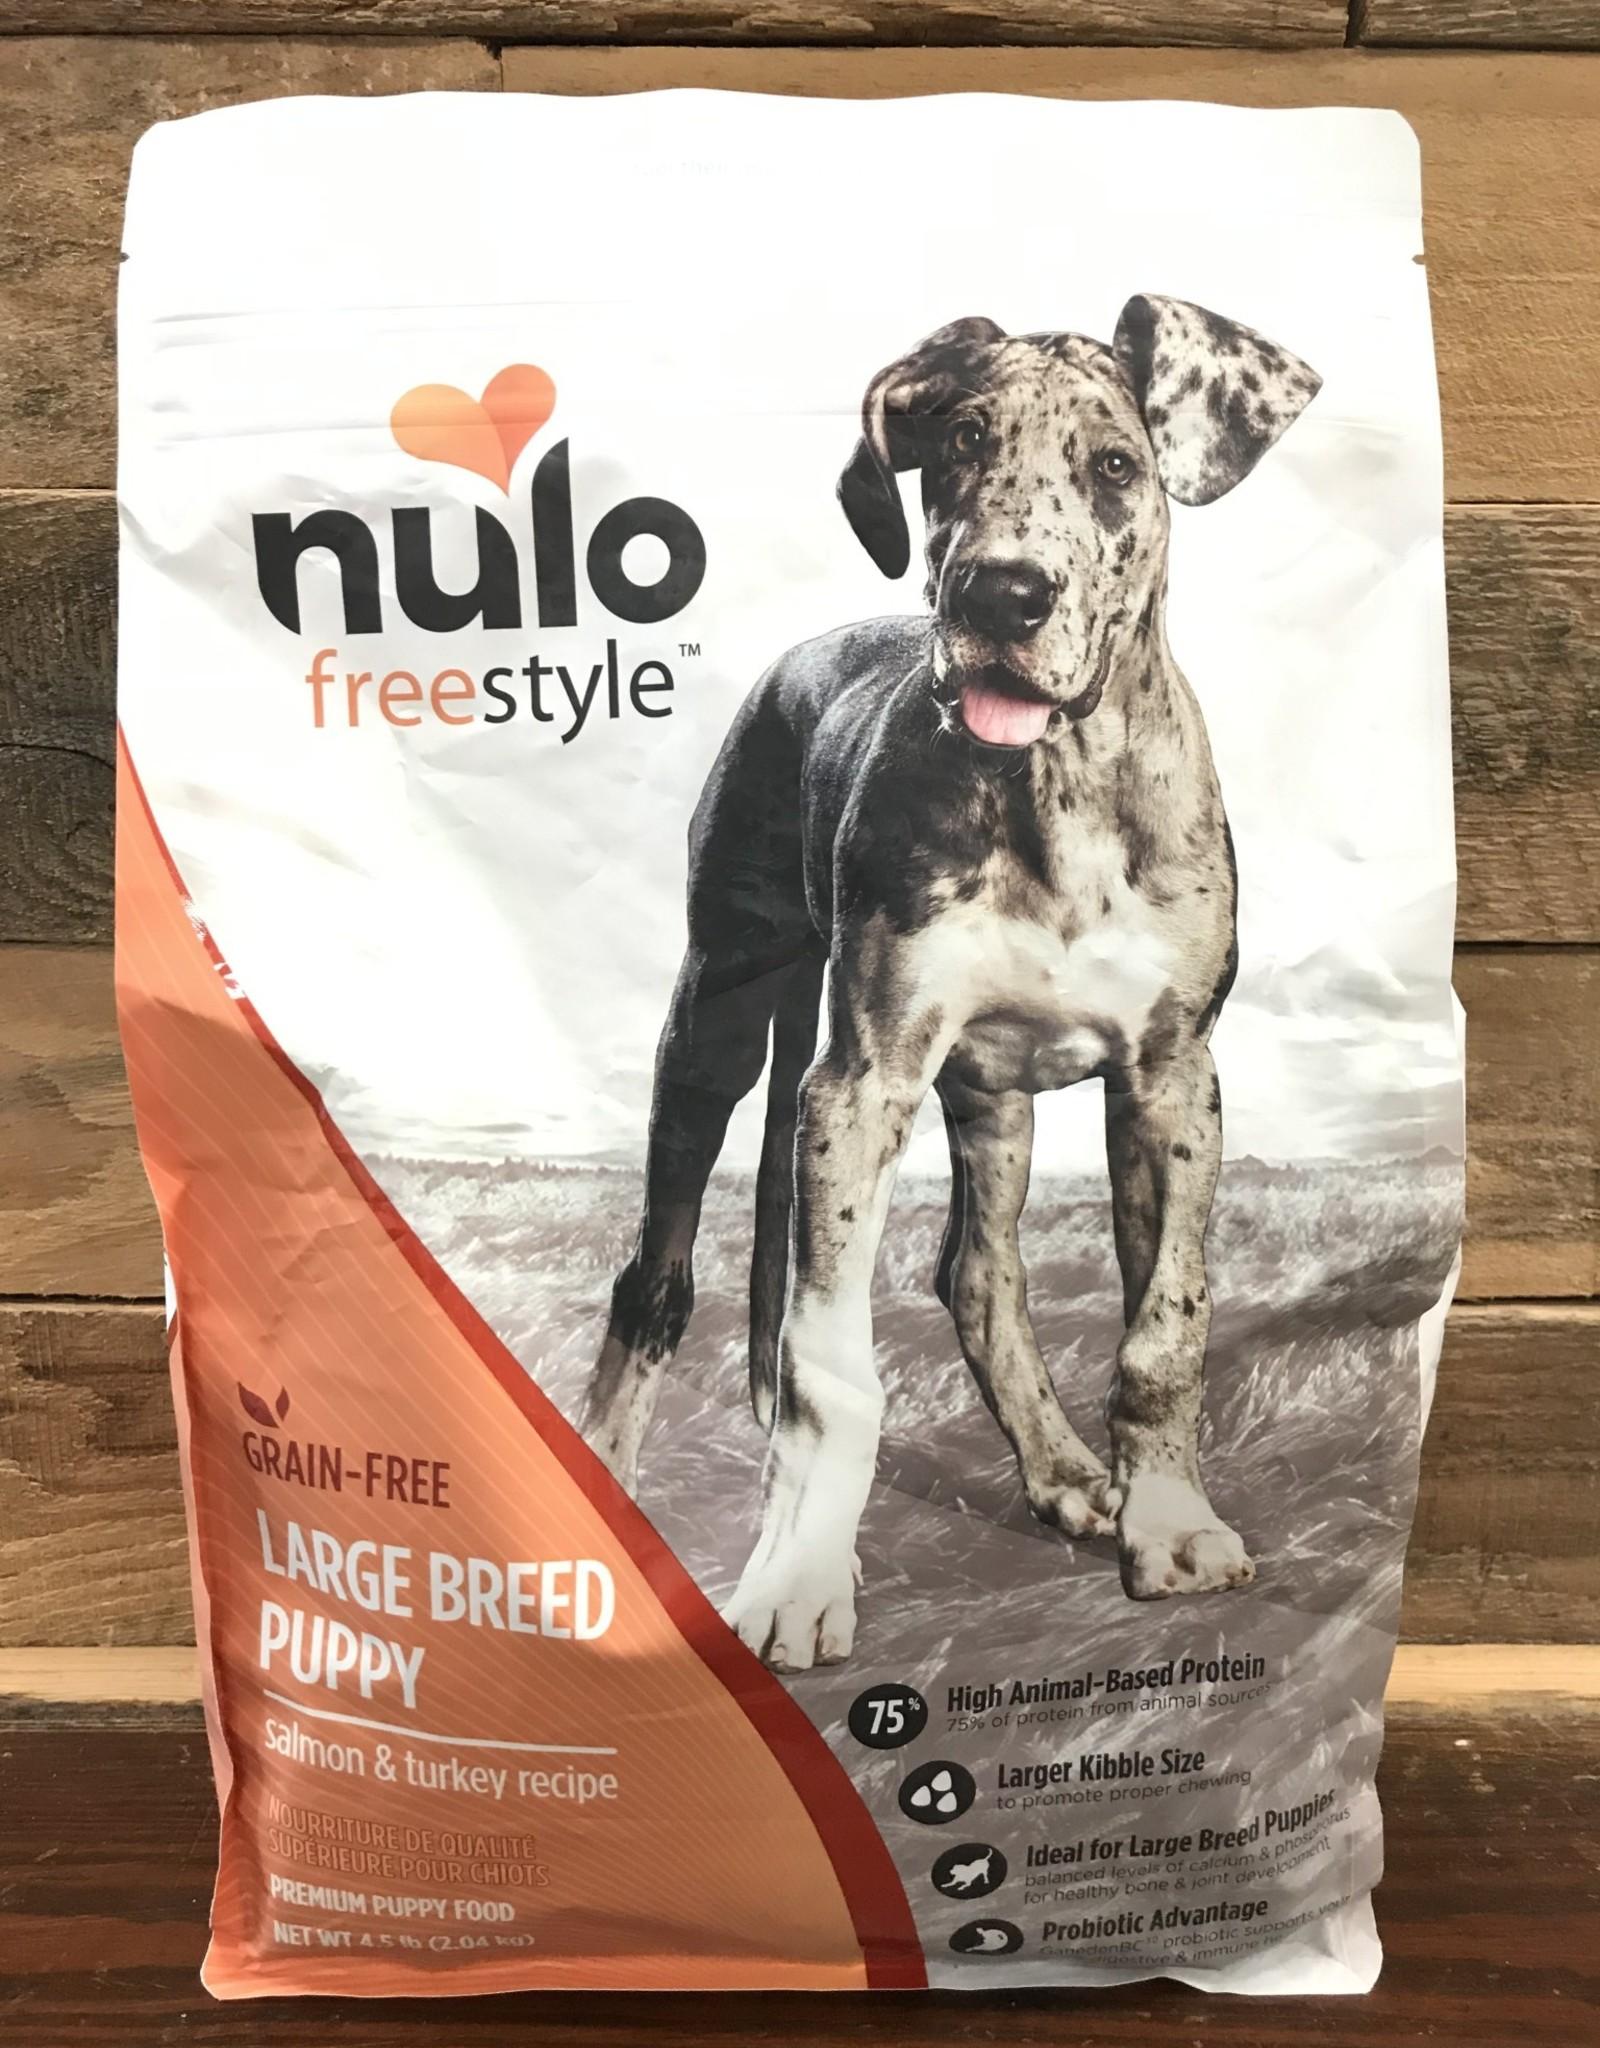 Nulo FreeStyle 4.5# Grain Free Large Breed Puppy Salmon & Turkey